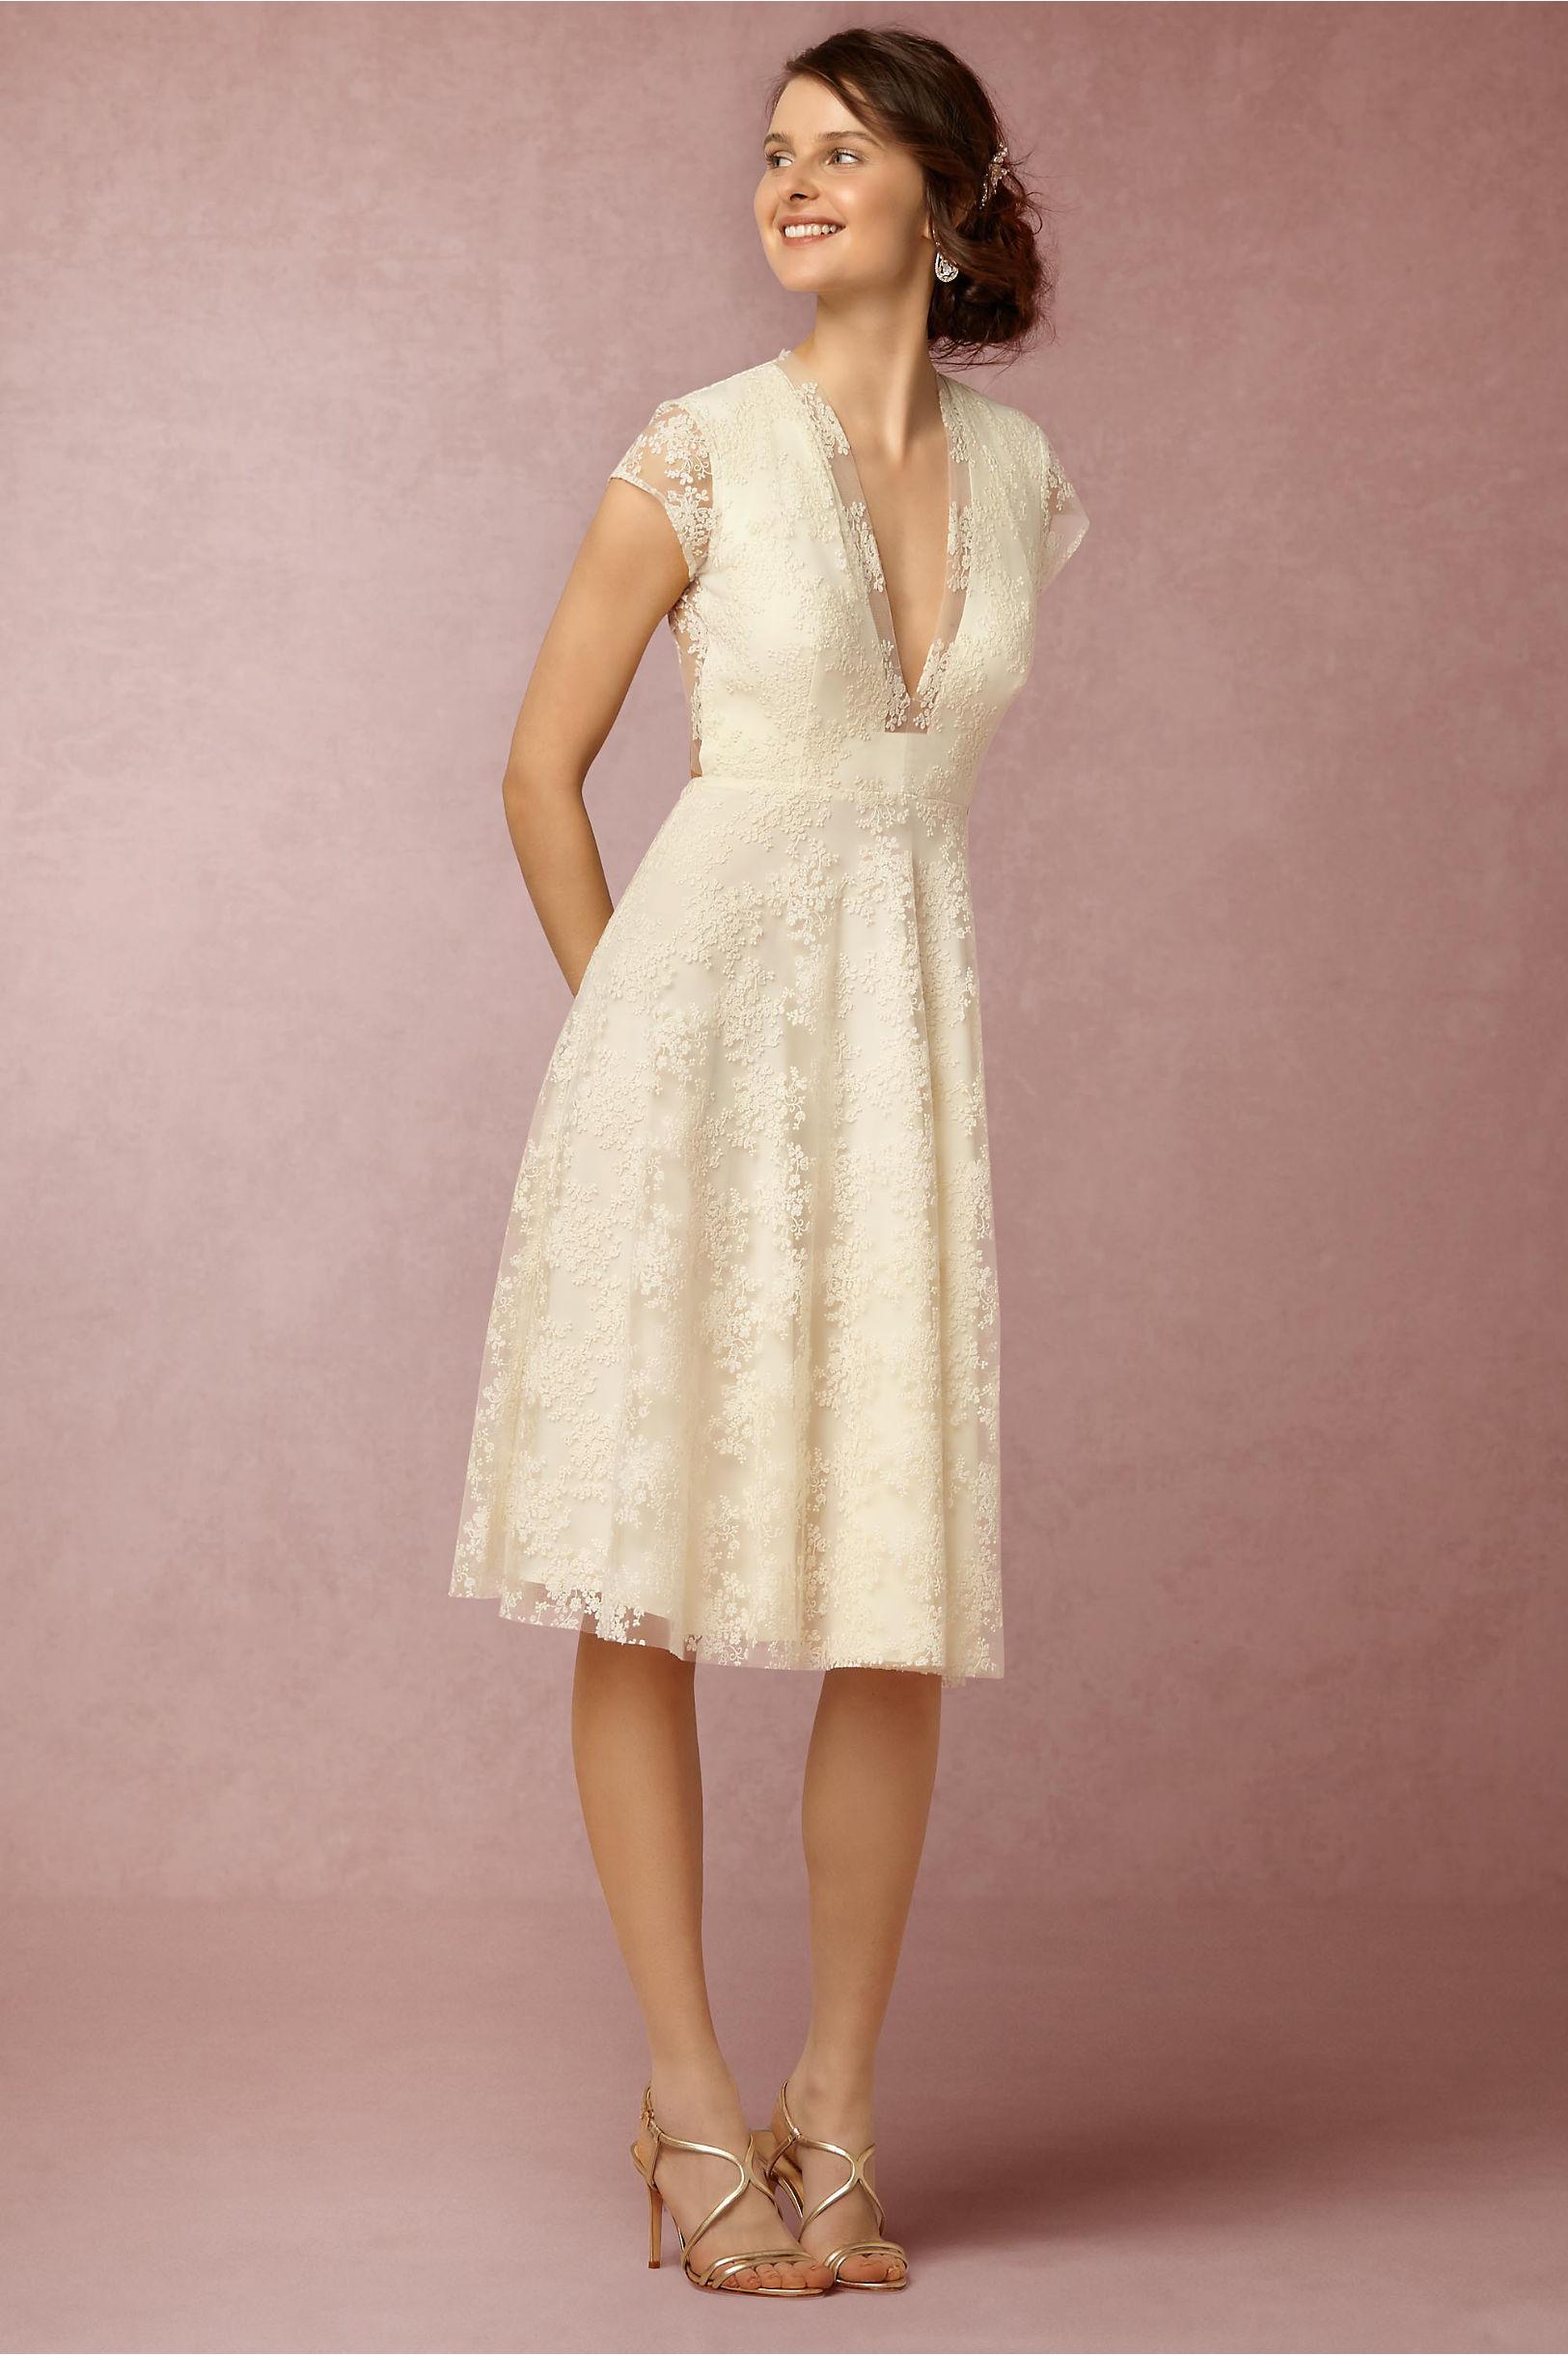 Aaliyah Dress in Sale | BHLDN